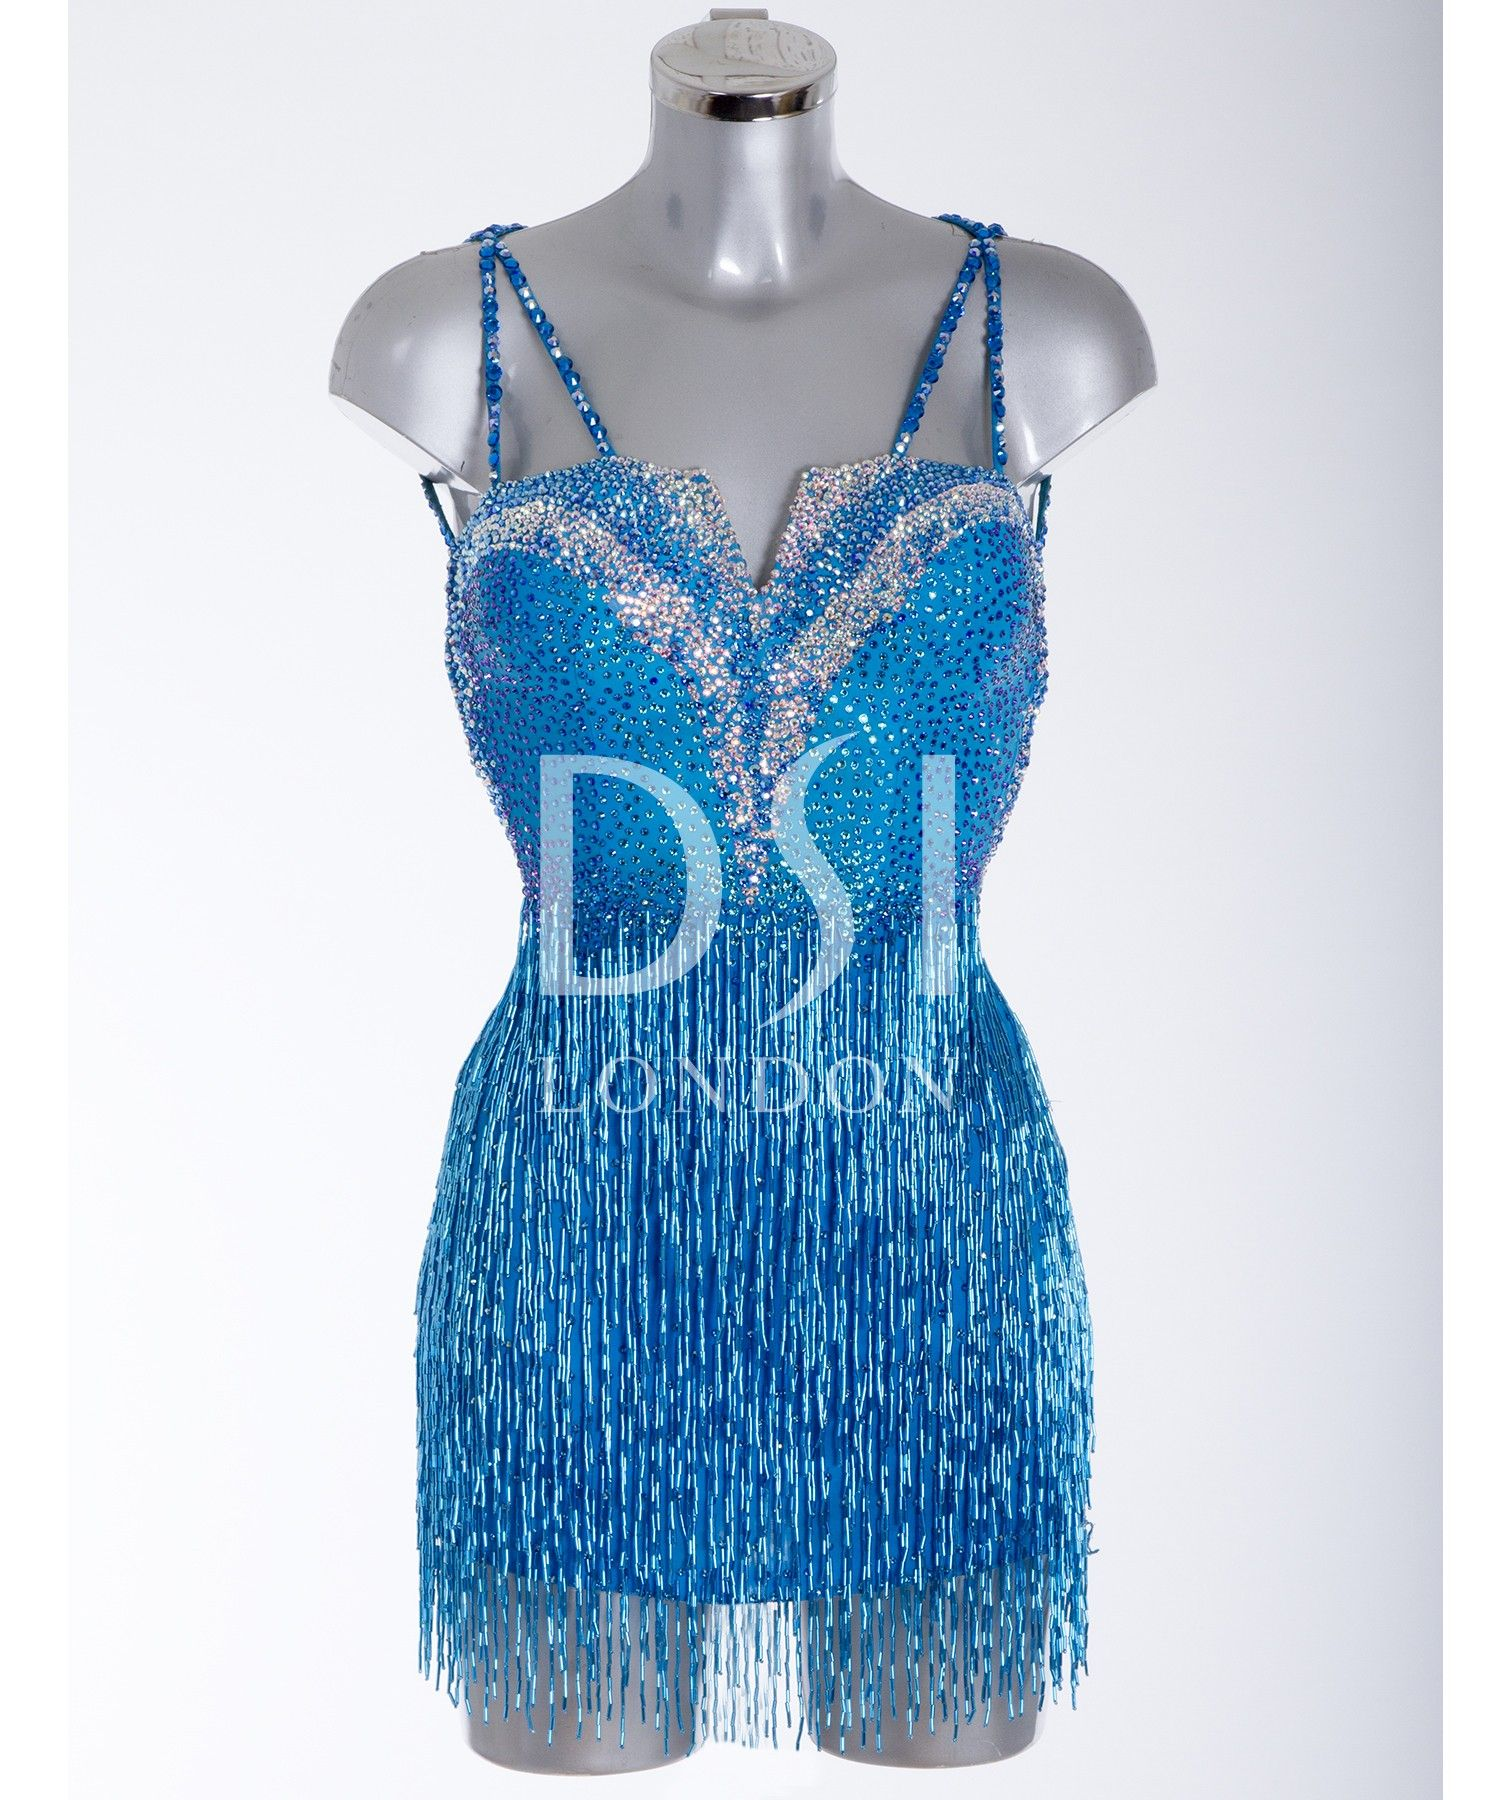 392686 Turquosie Latin Dress | Latin dresses for sale ...